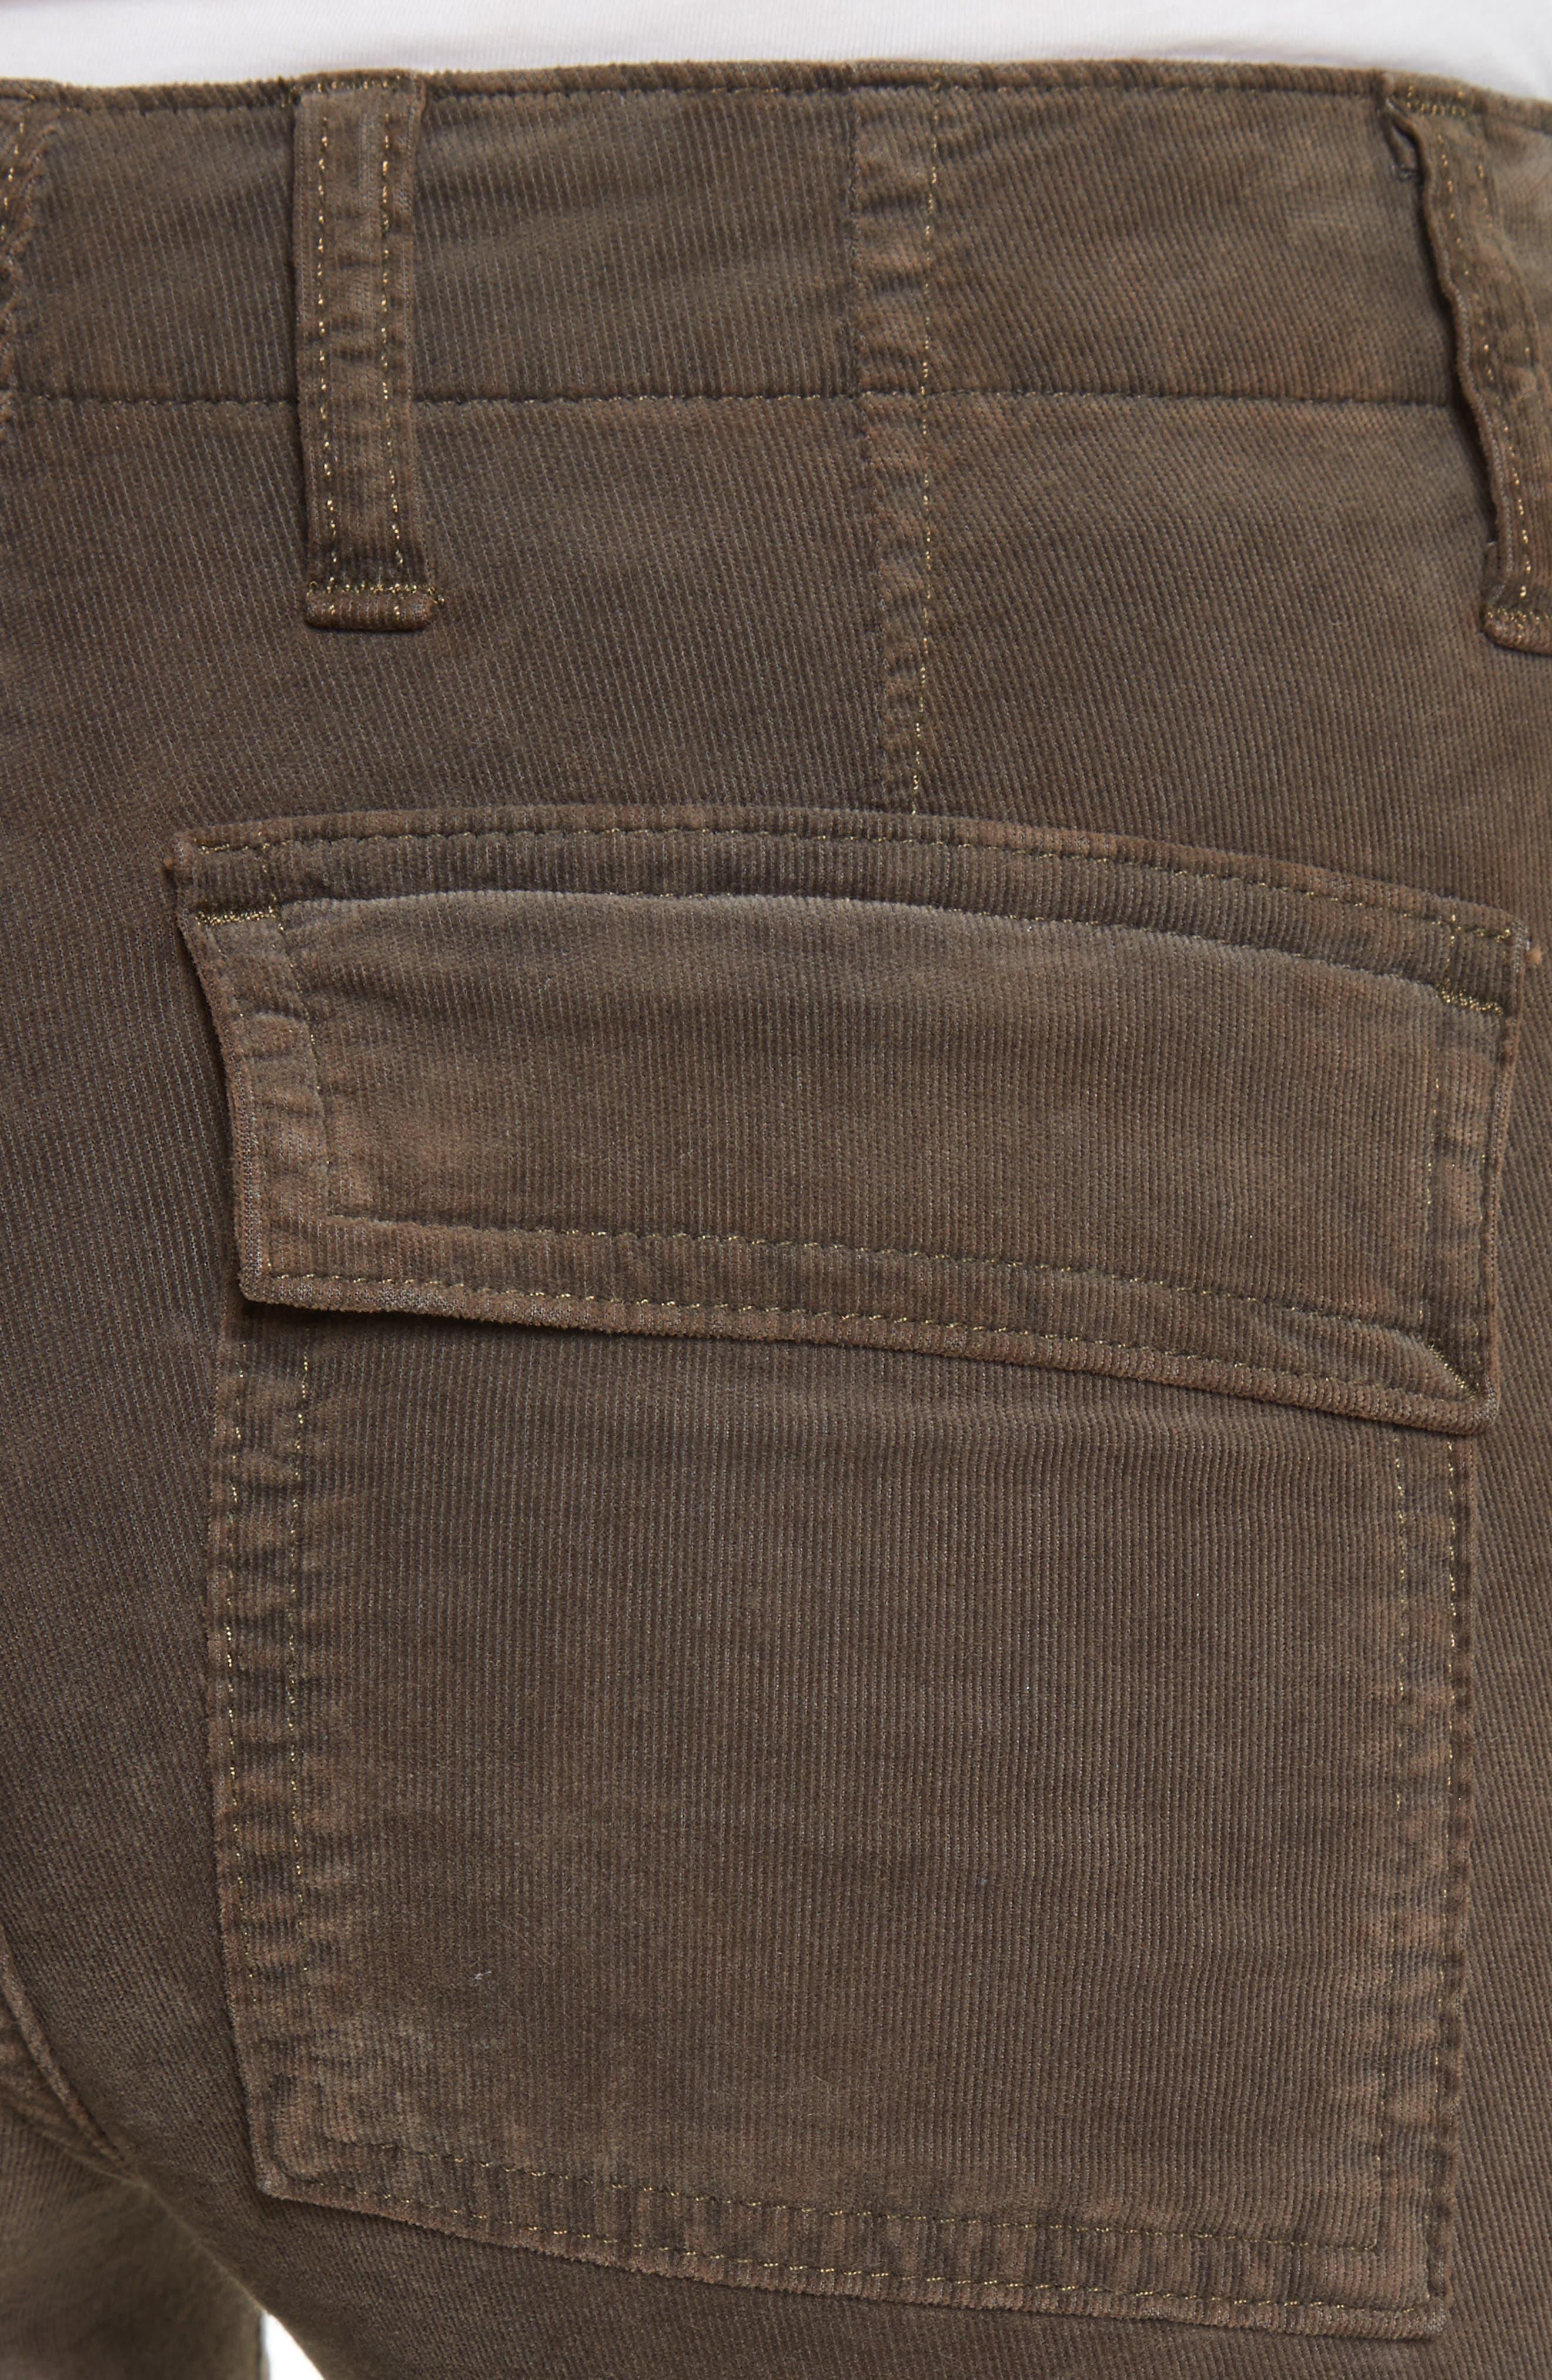 Skinny Corduroy Cargo Pants,                             Alternate thumbnail 10, color,